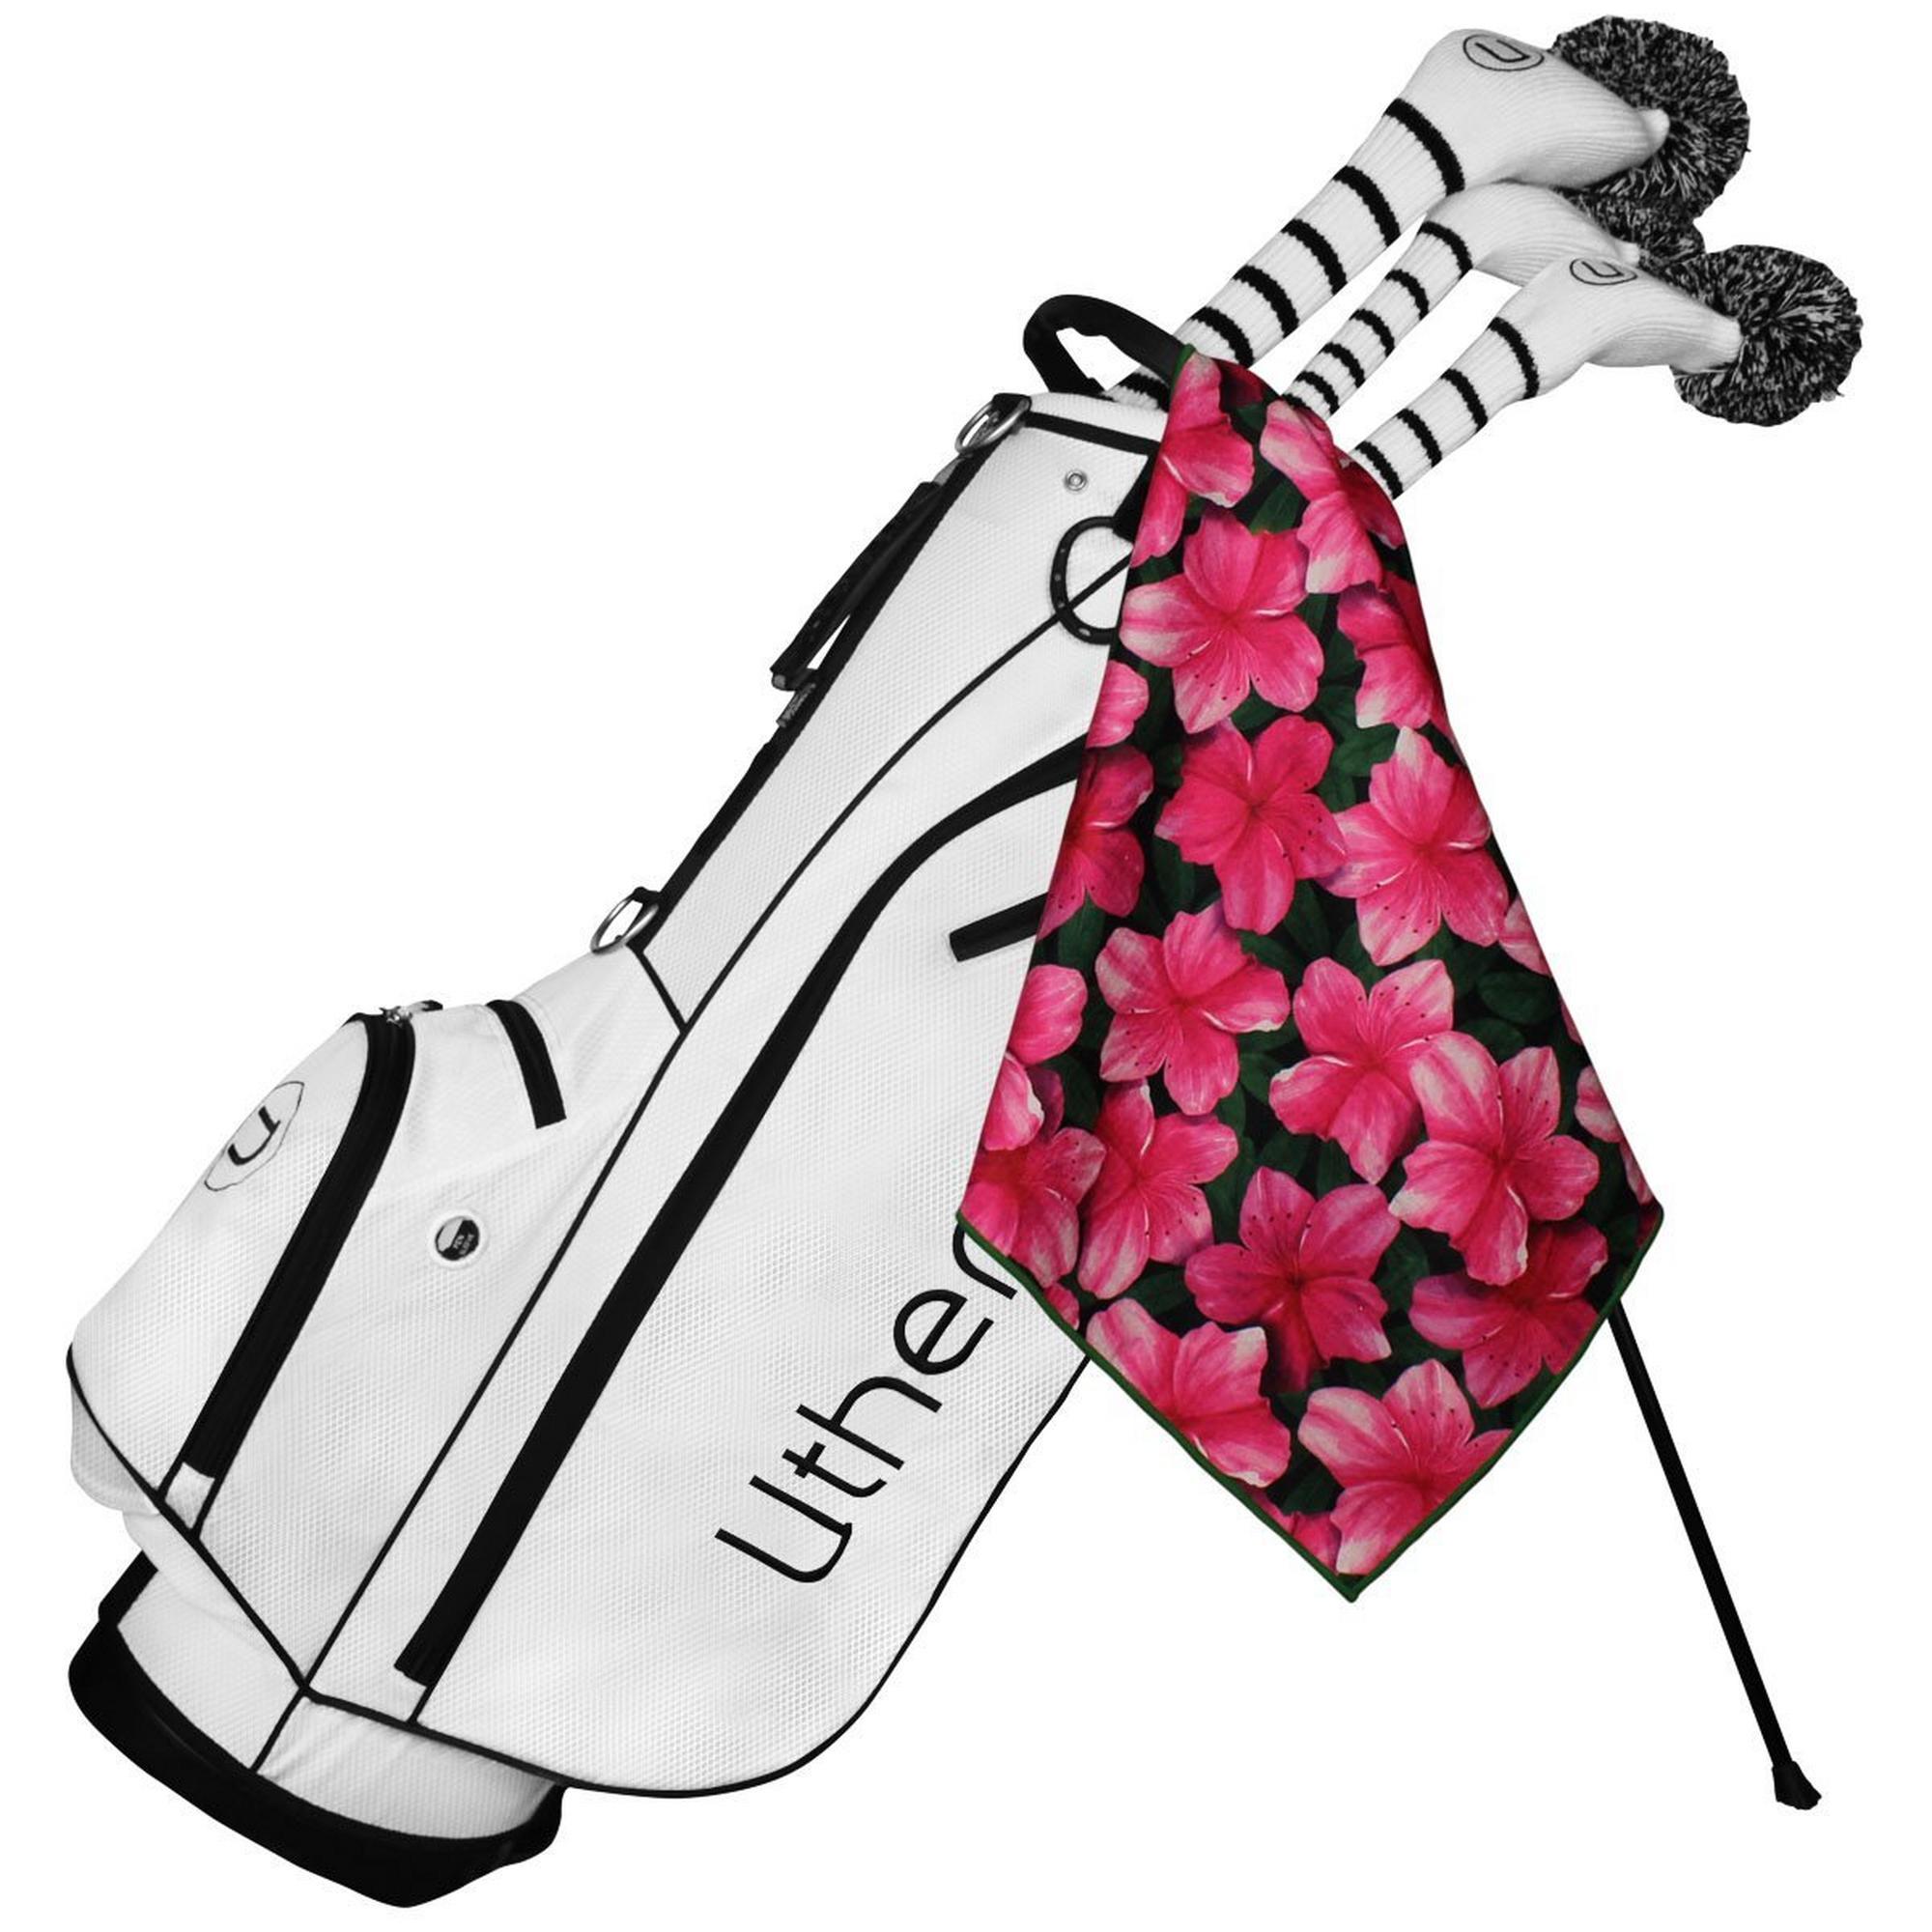 Microfiber Tour Golf Towel - Azaleas of Augusta